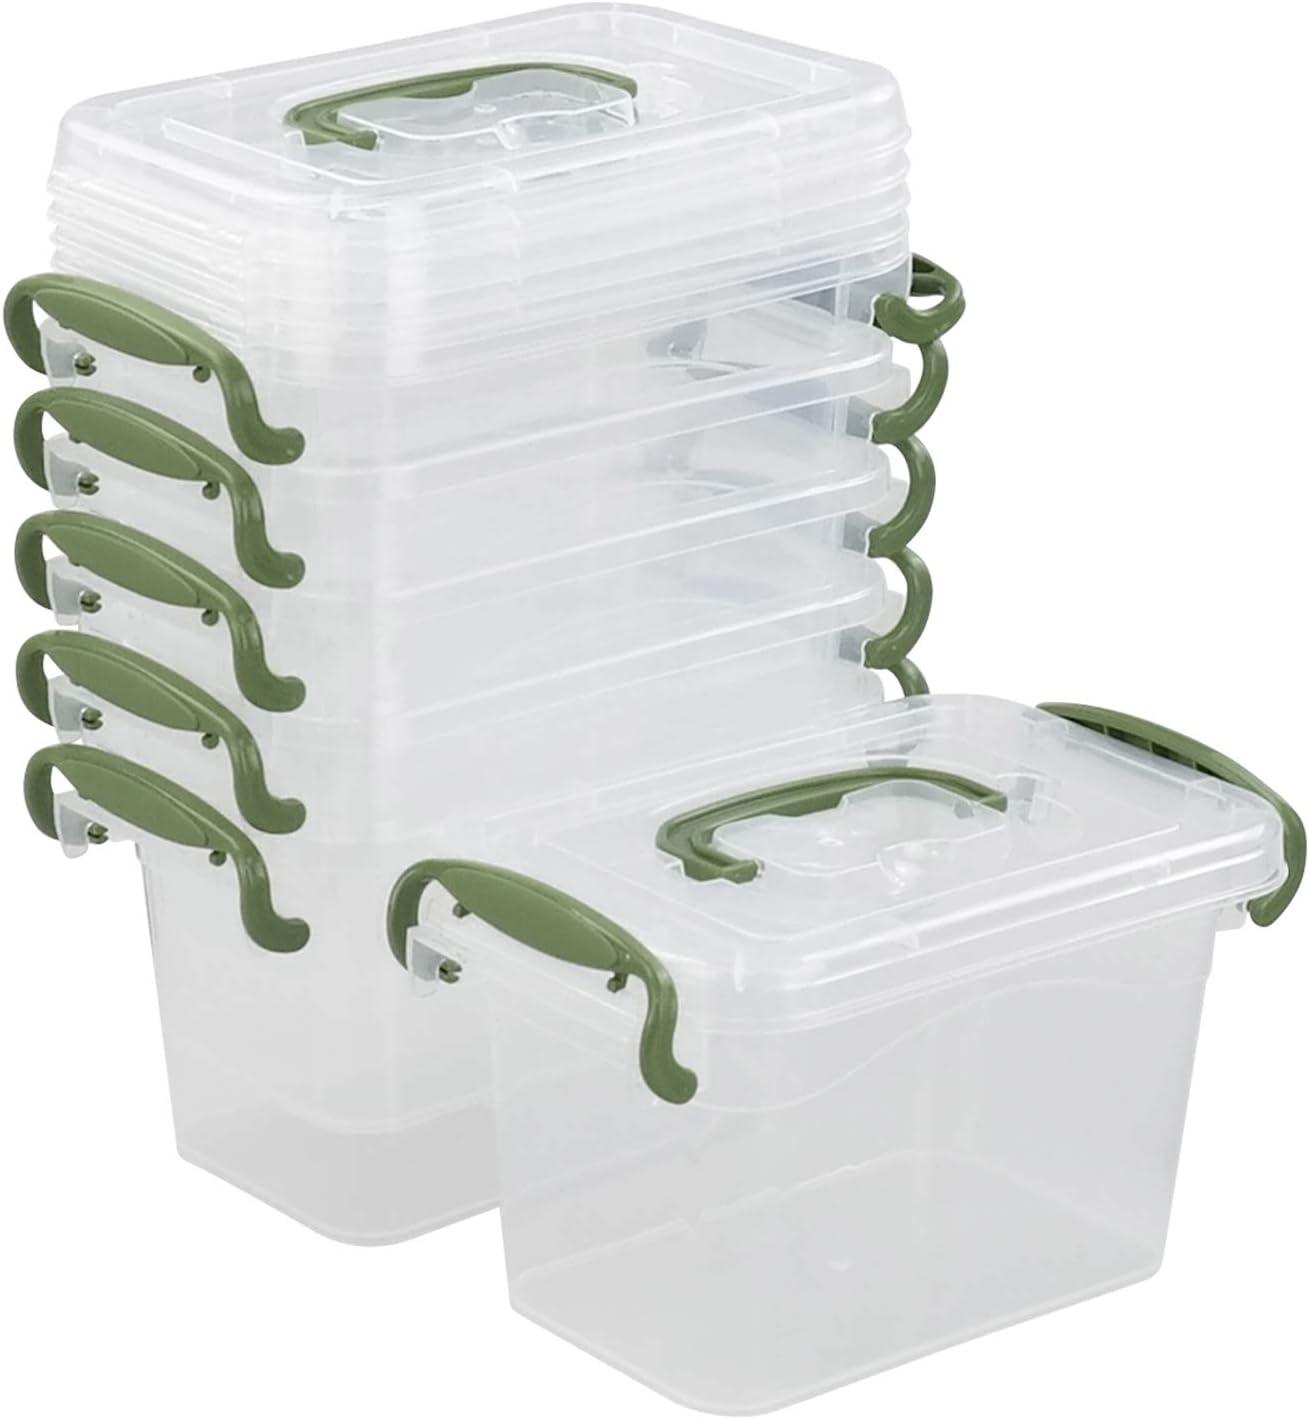 Spring new work Ortodayes Popular overseas 6 Packs Mini Latch Storage Clear Plastic Bins wit Box